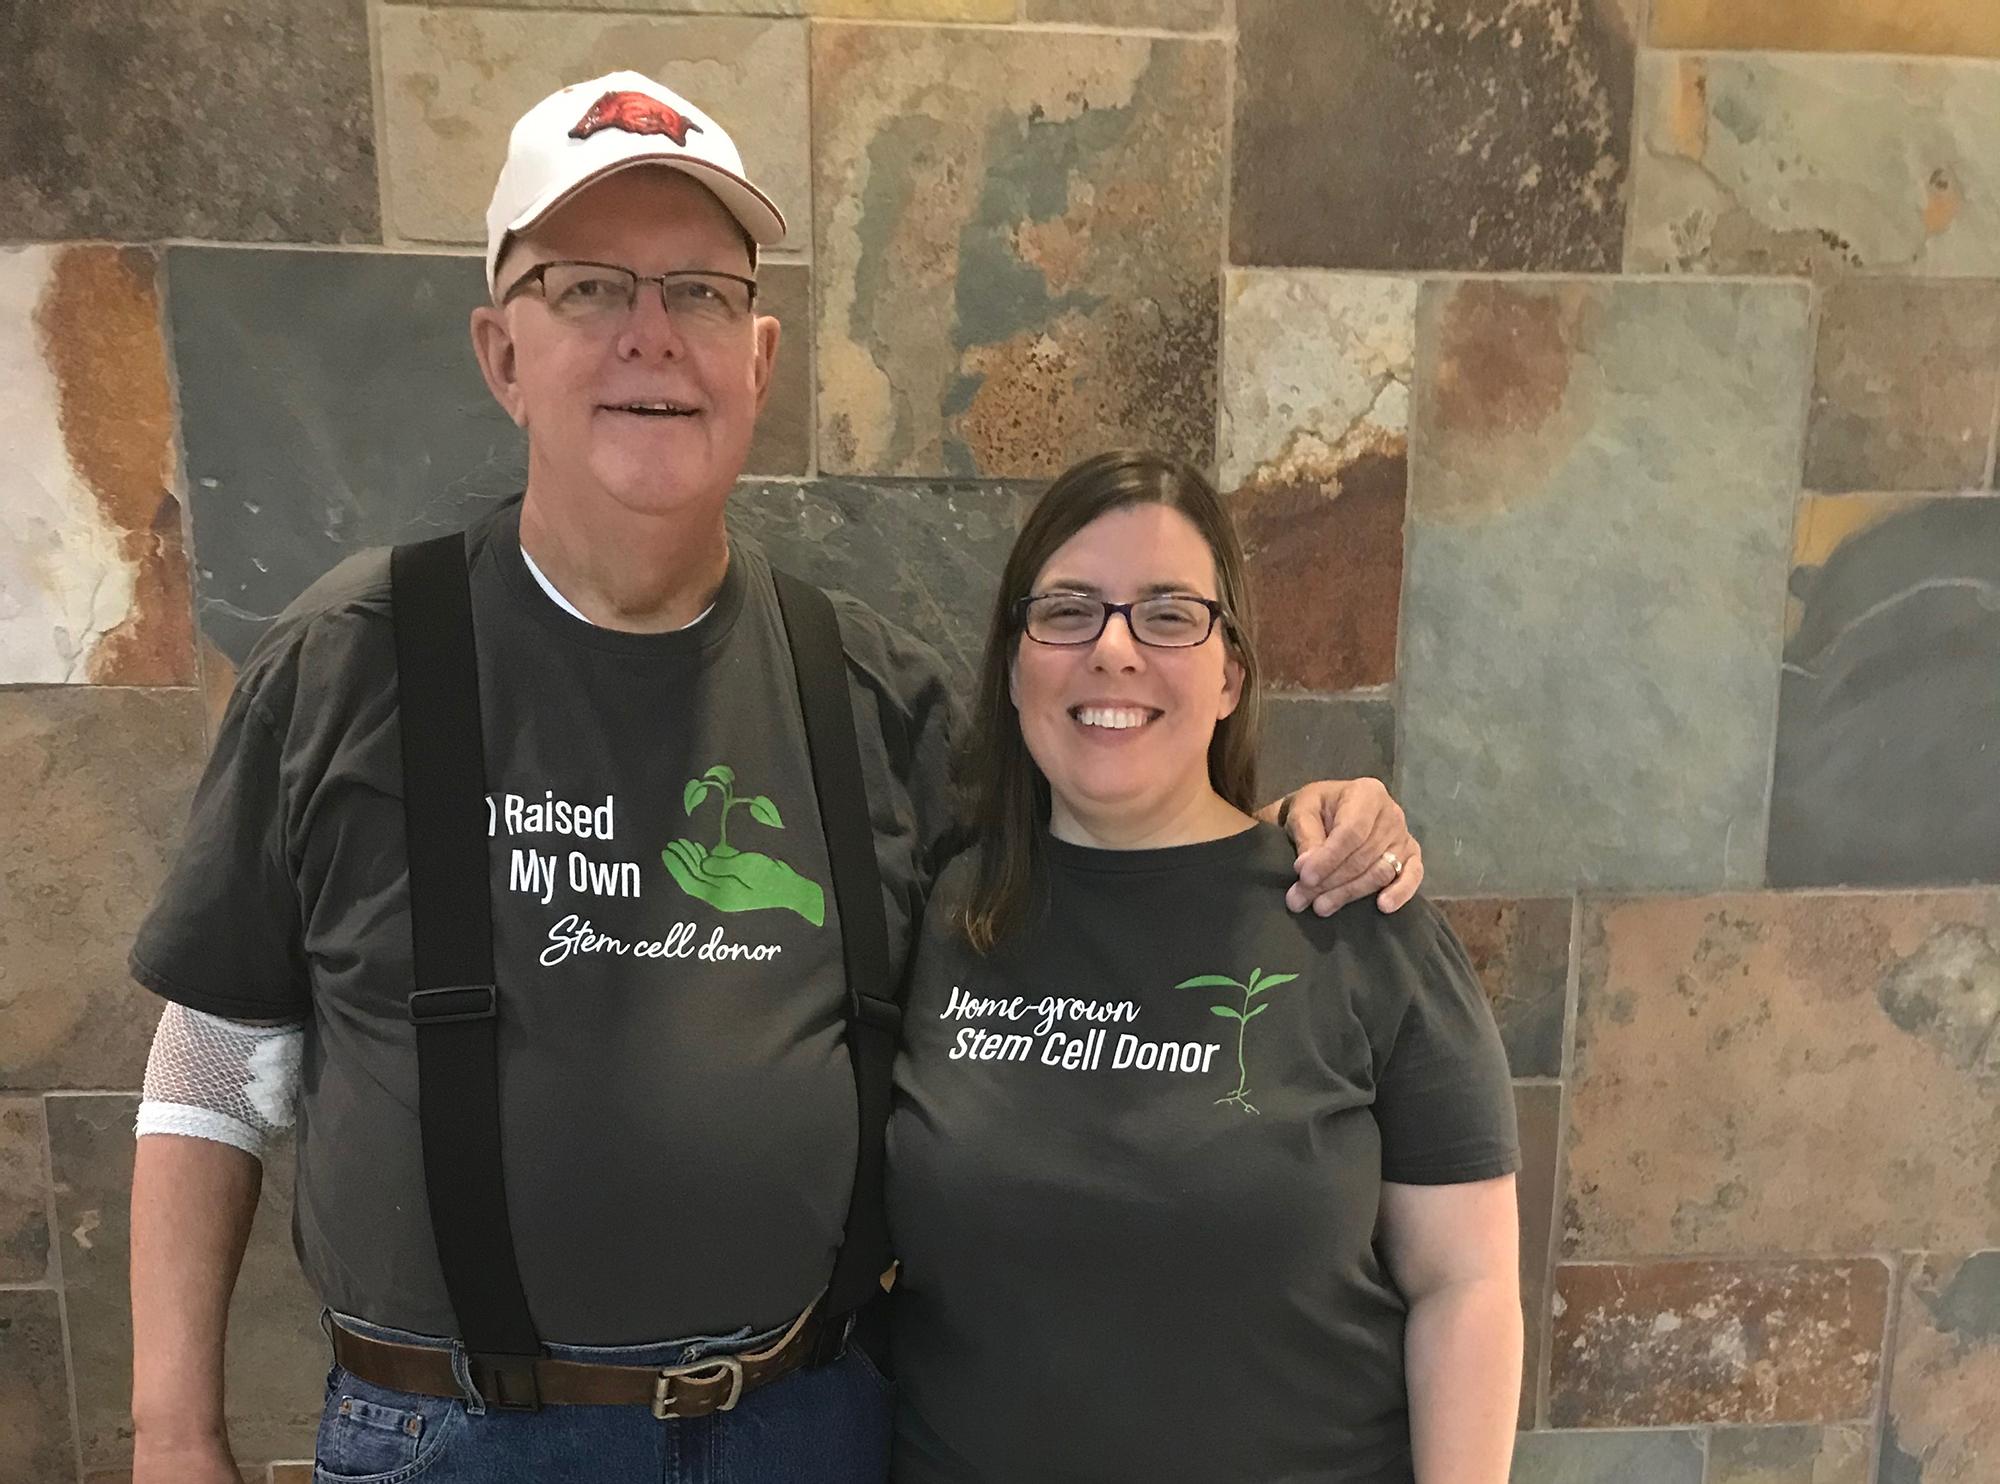 Butch King and Paula Draeger